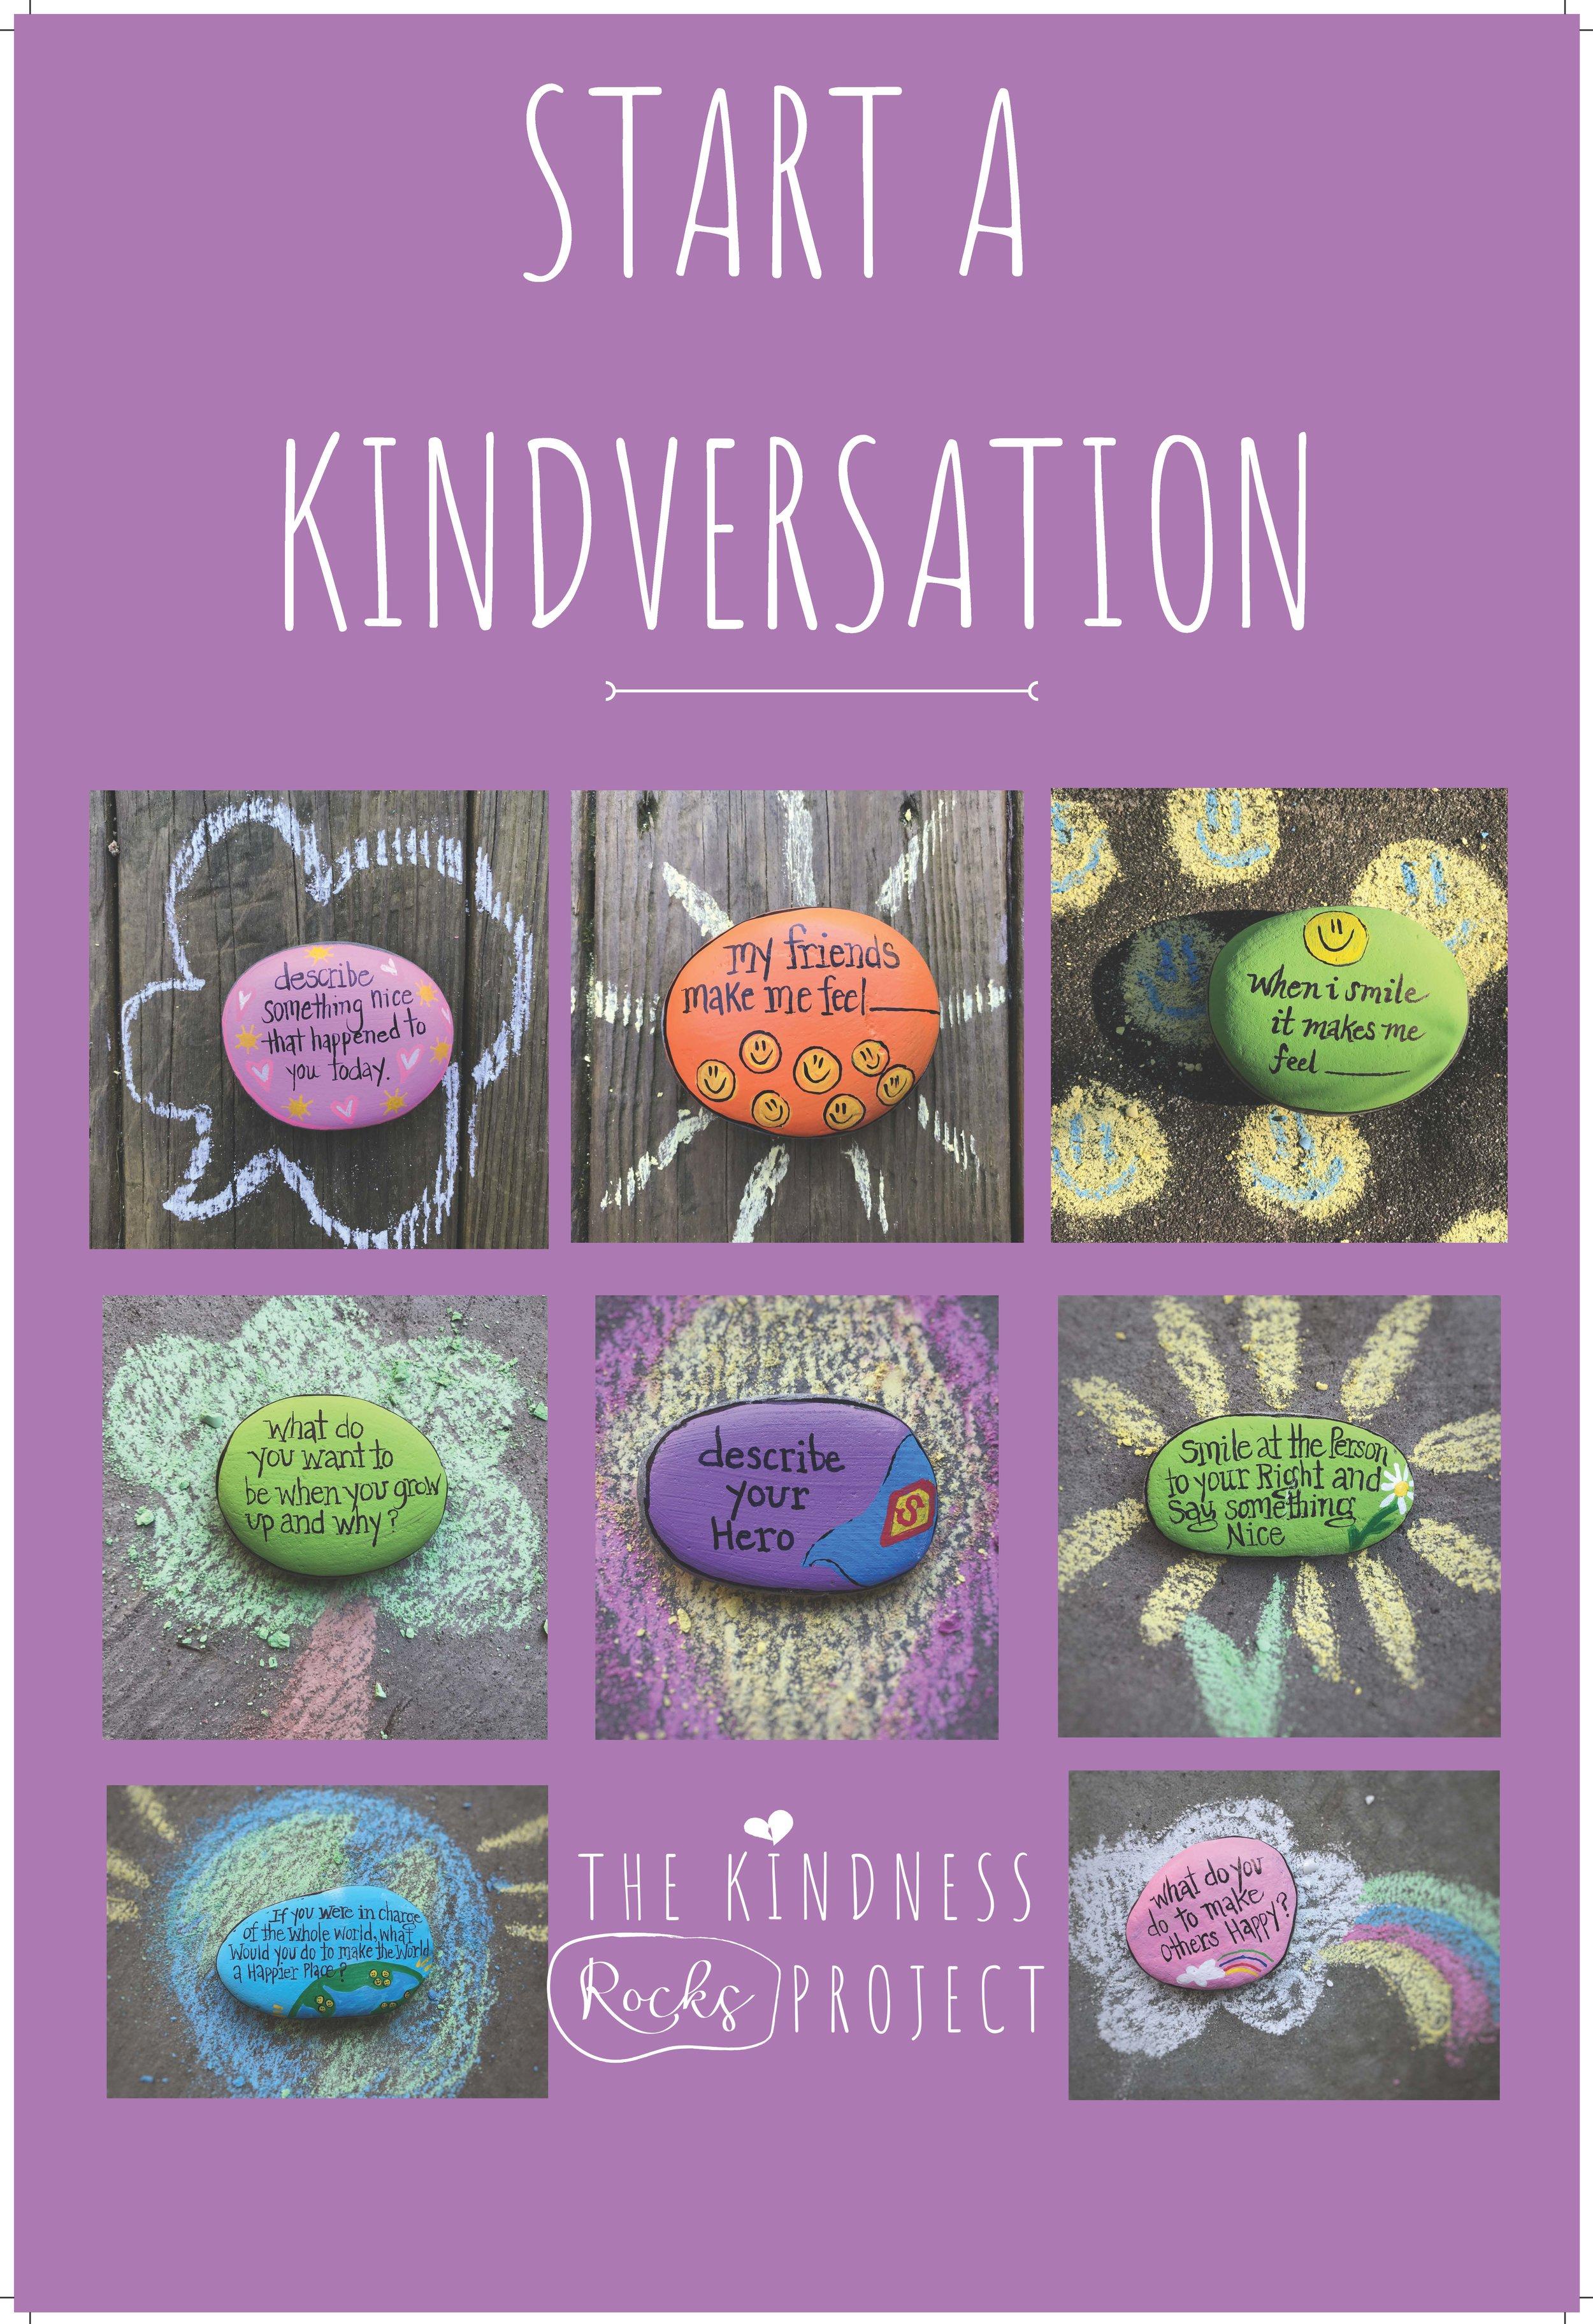 Start a kindversation poster.jpg